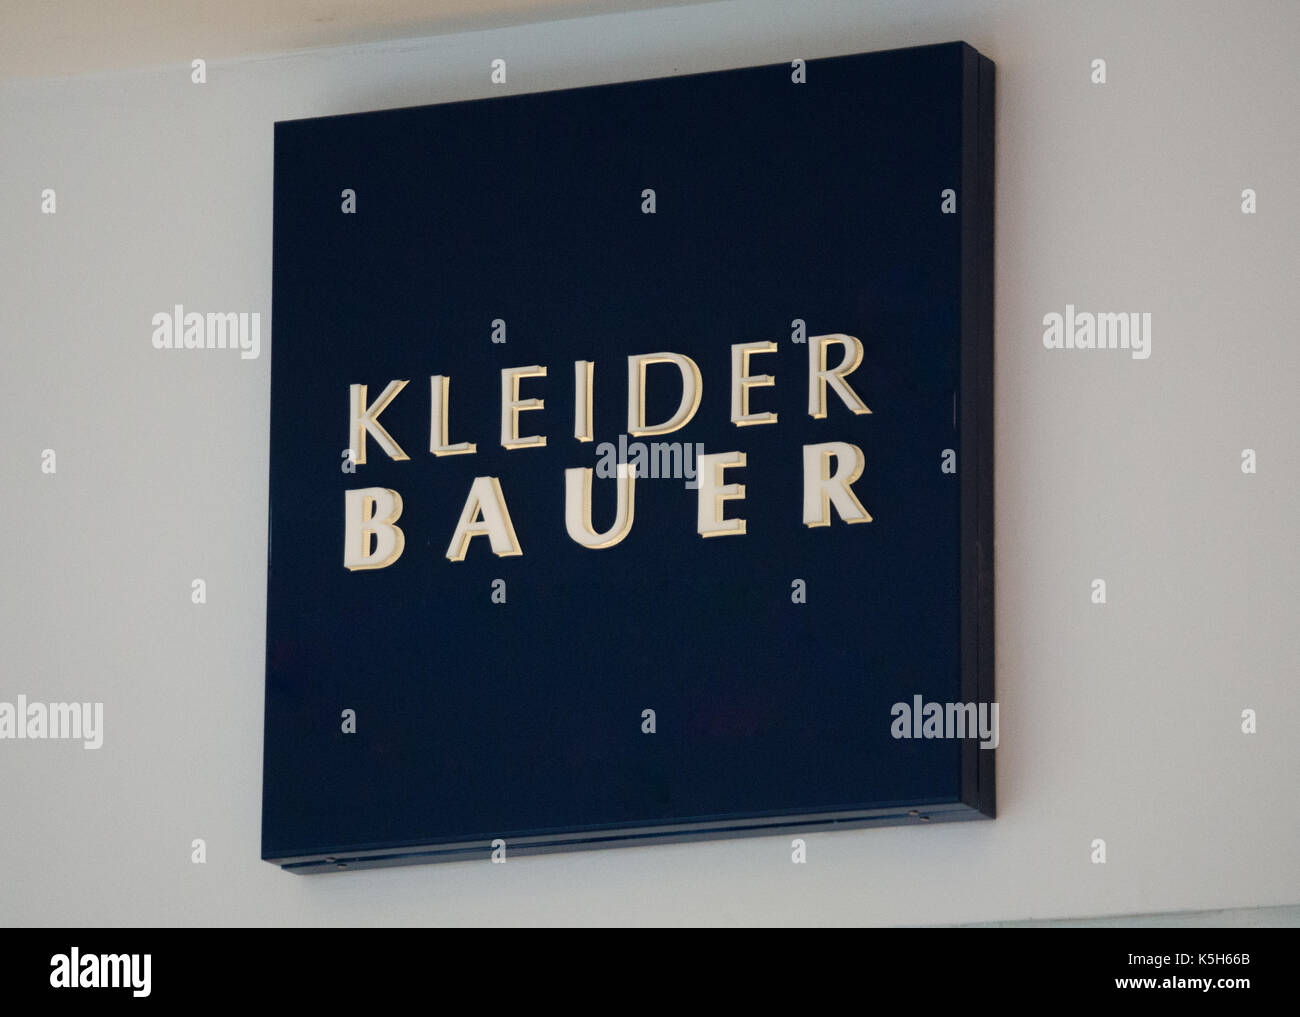 Graz, Austria - September 8th 2017: Kleider Bauer logo above the store entrance at Seiersberg Shopping Center - Stock Image